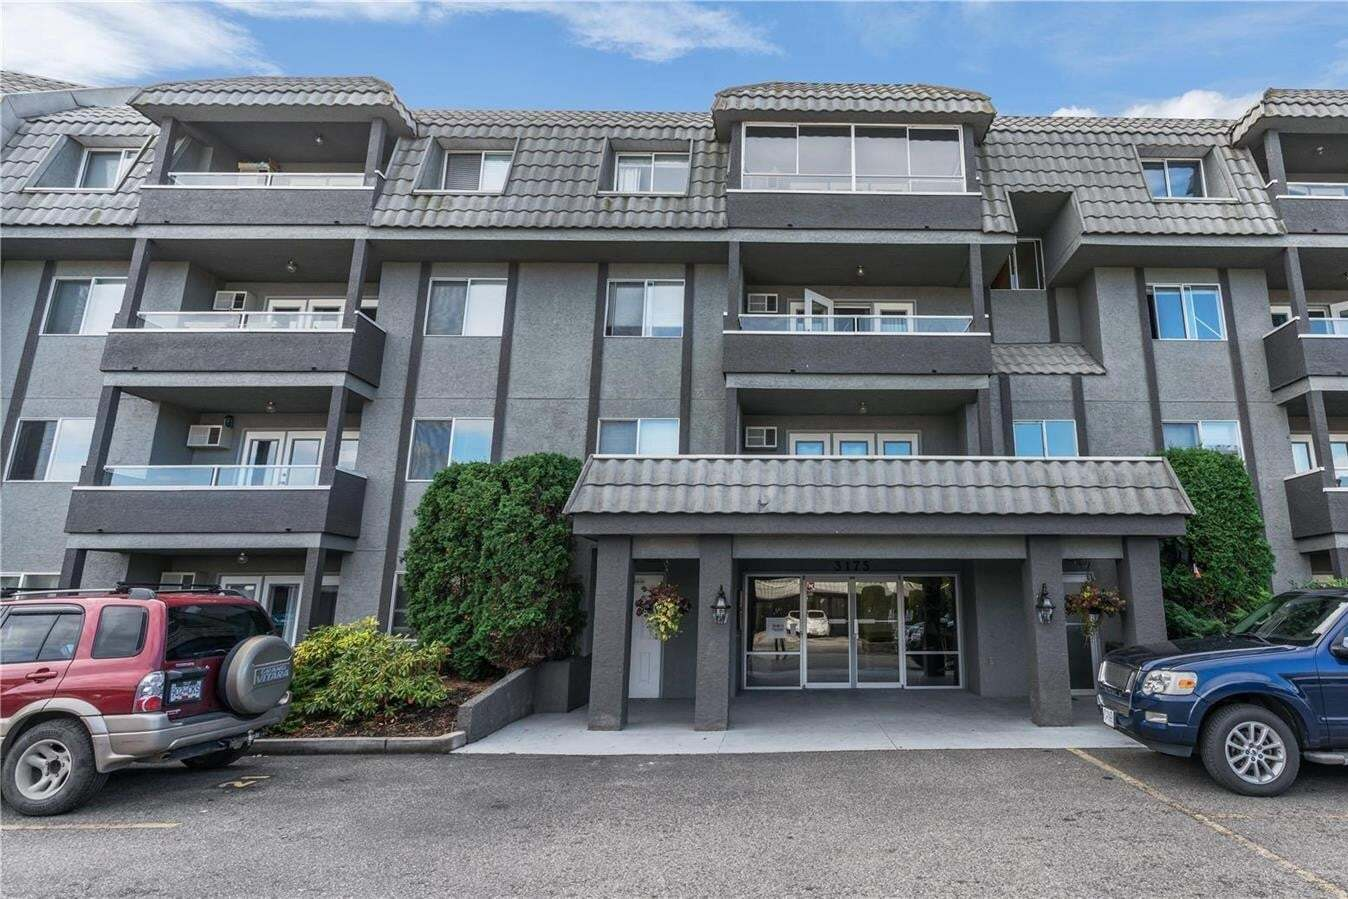 Condo for sale at 3175 De Montreuil Ct Unit 206 Kelowna British Columbia - MLS: 10217784